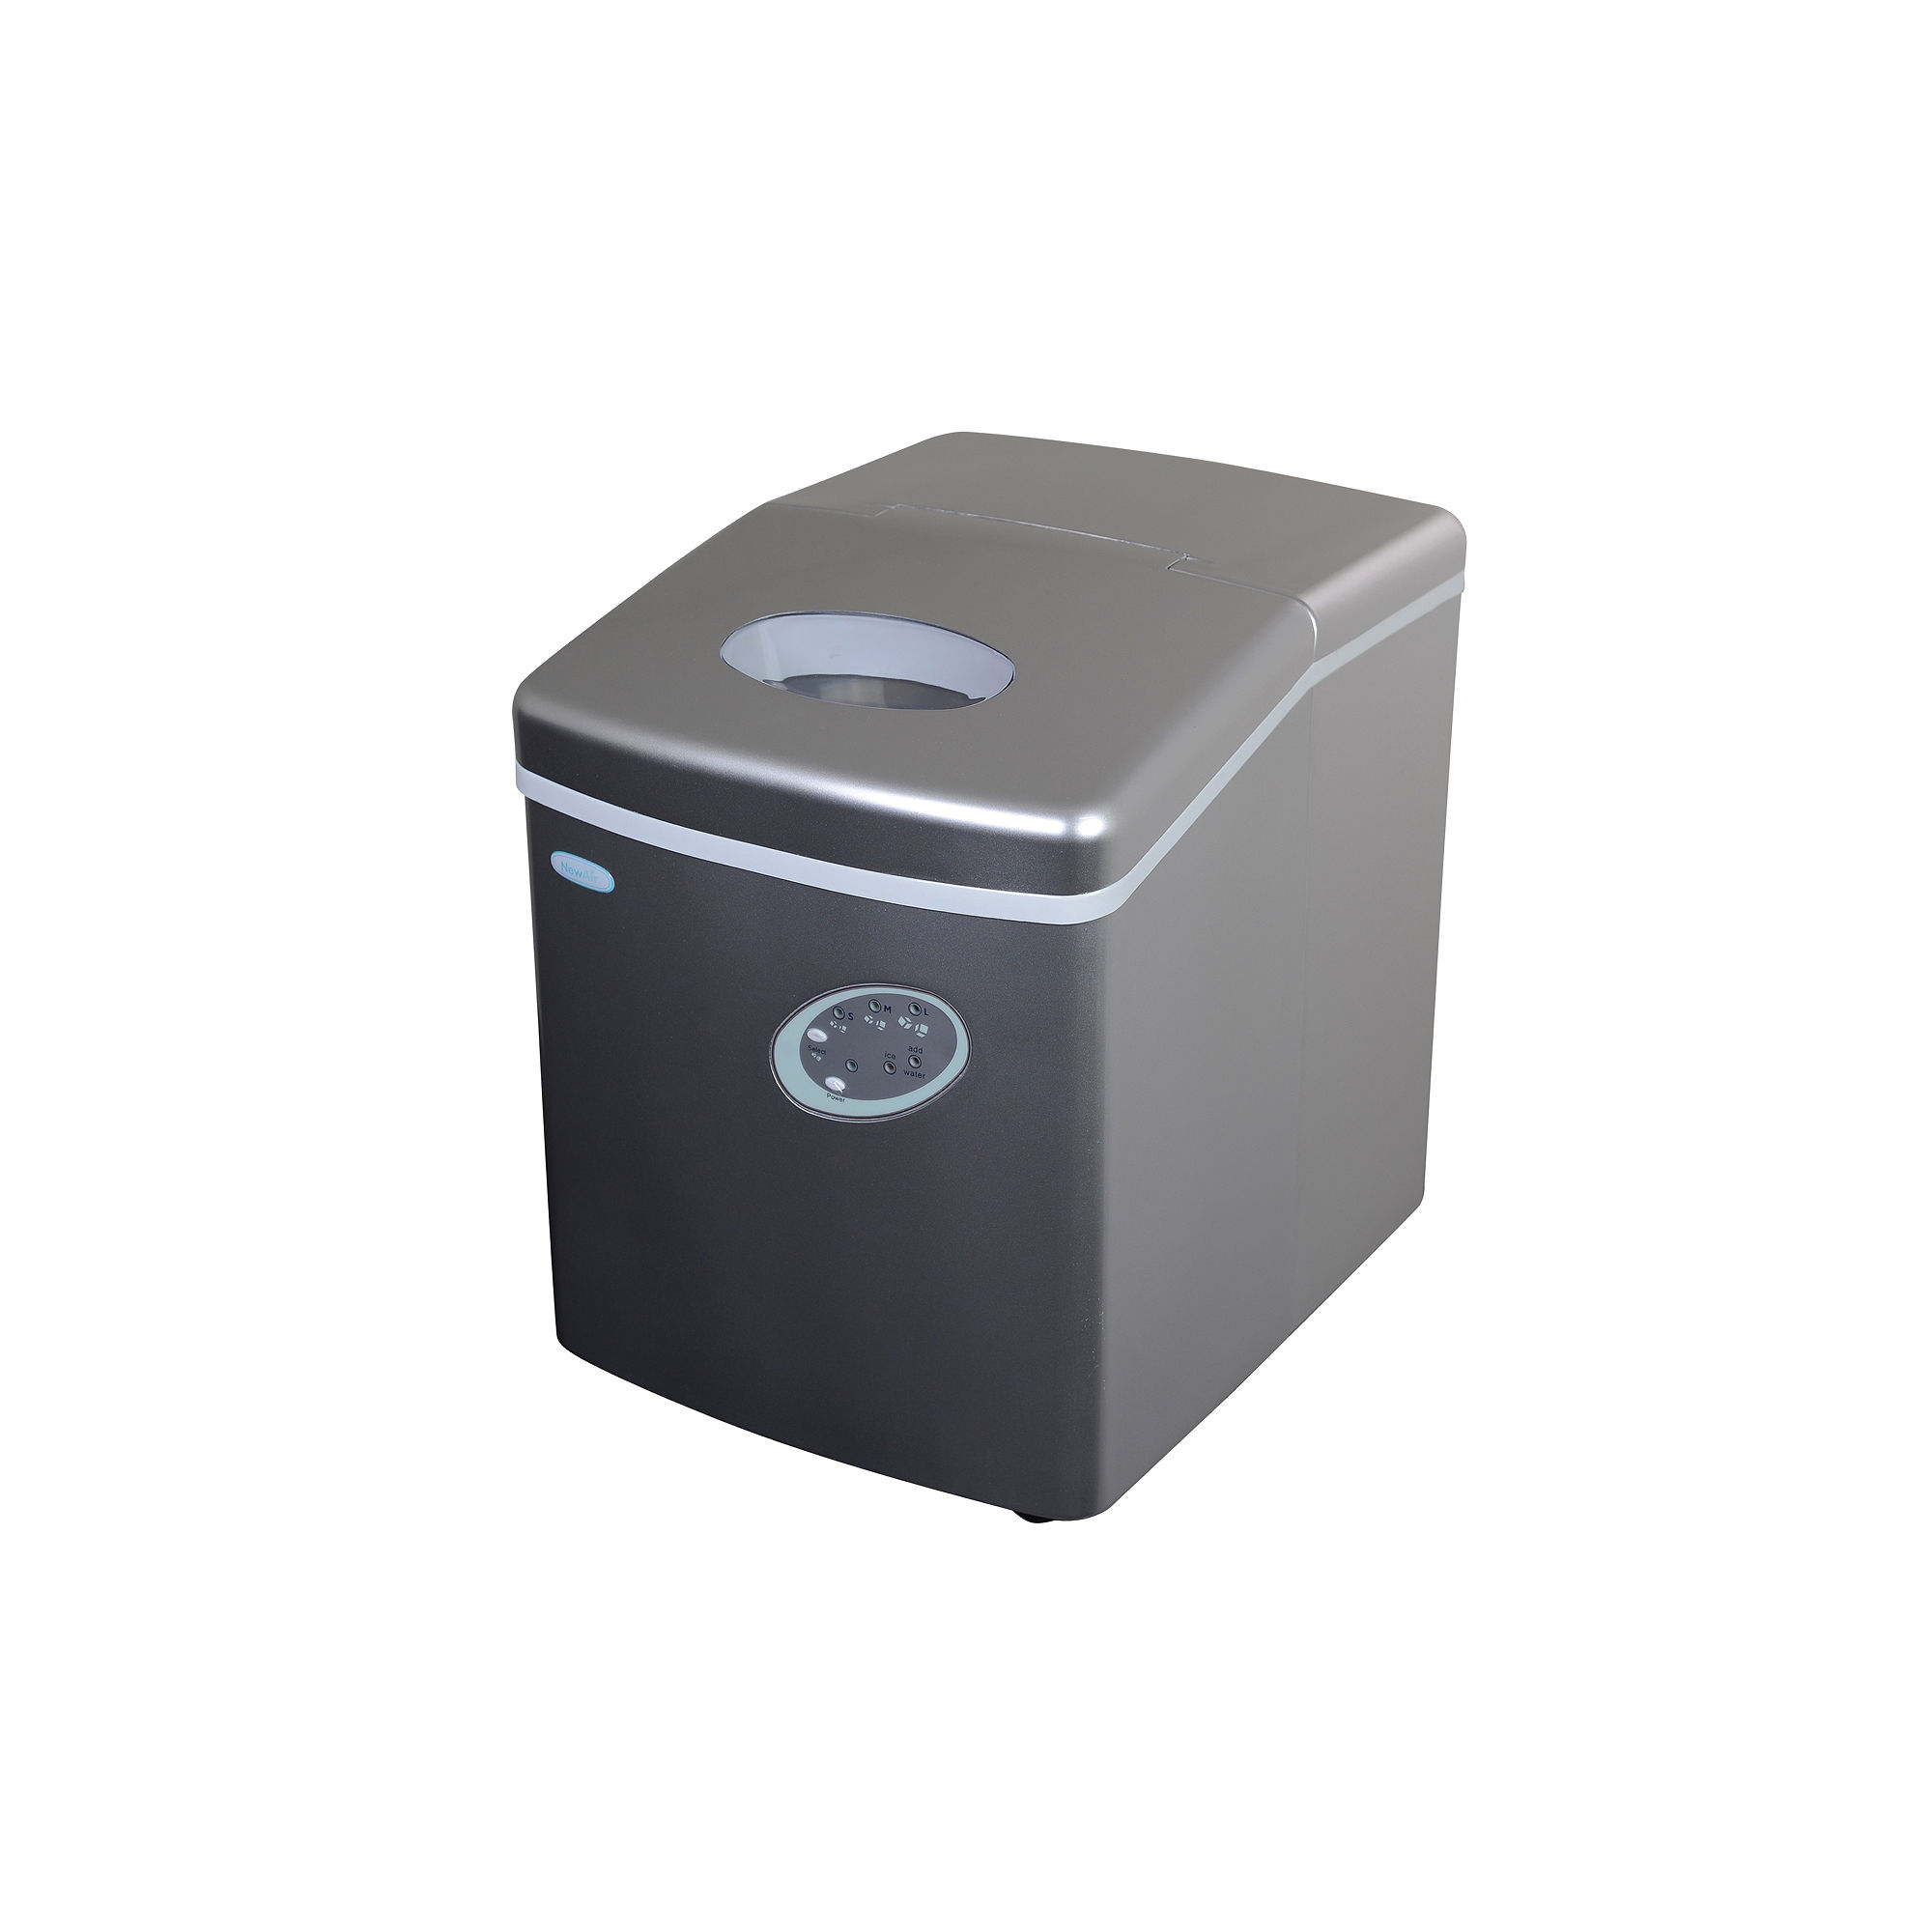 NewAir AI-100S Portable Ice Maker